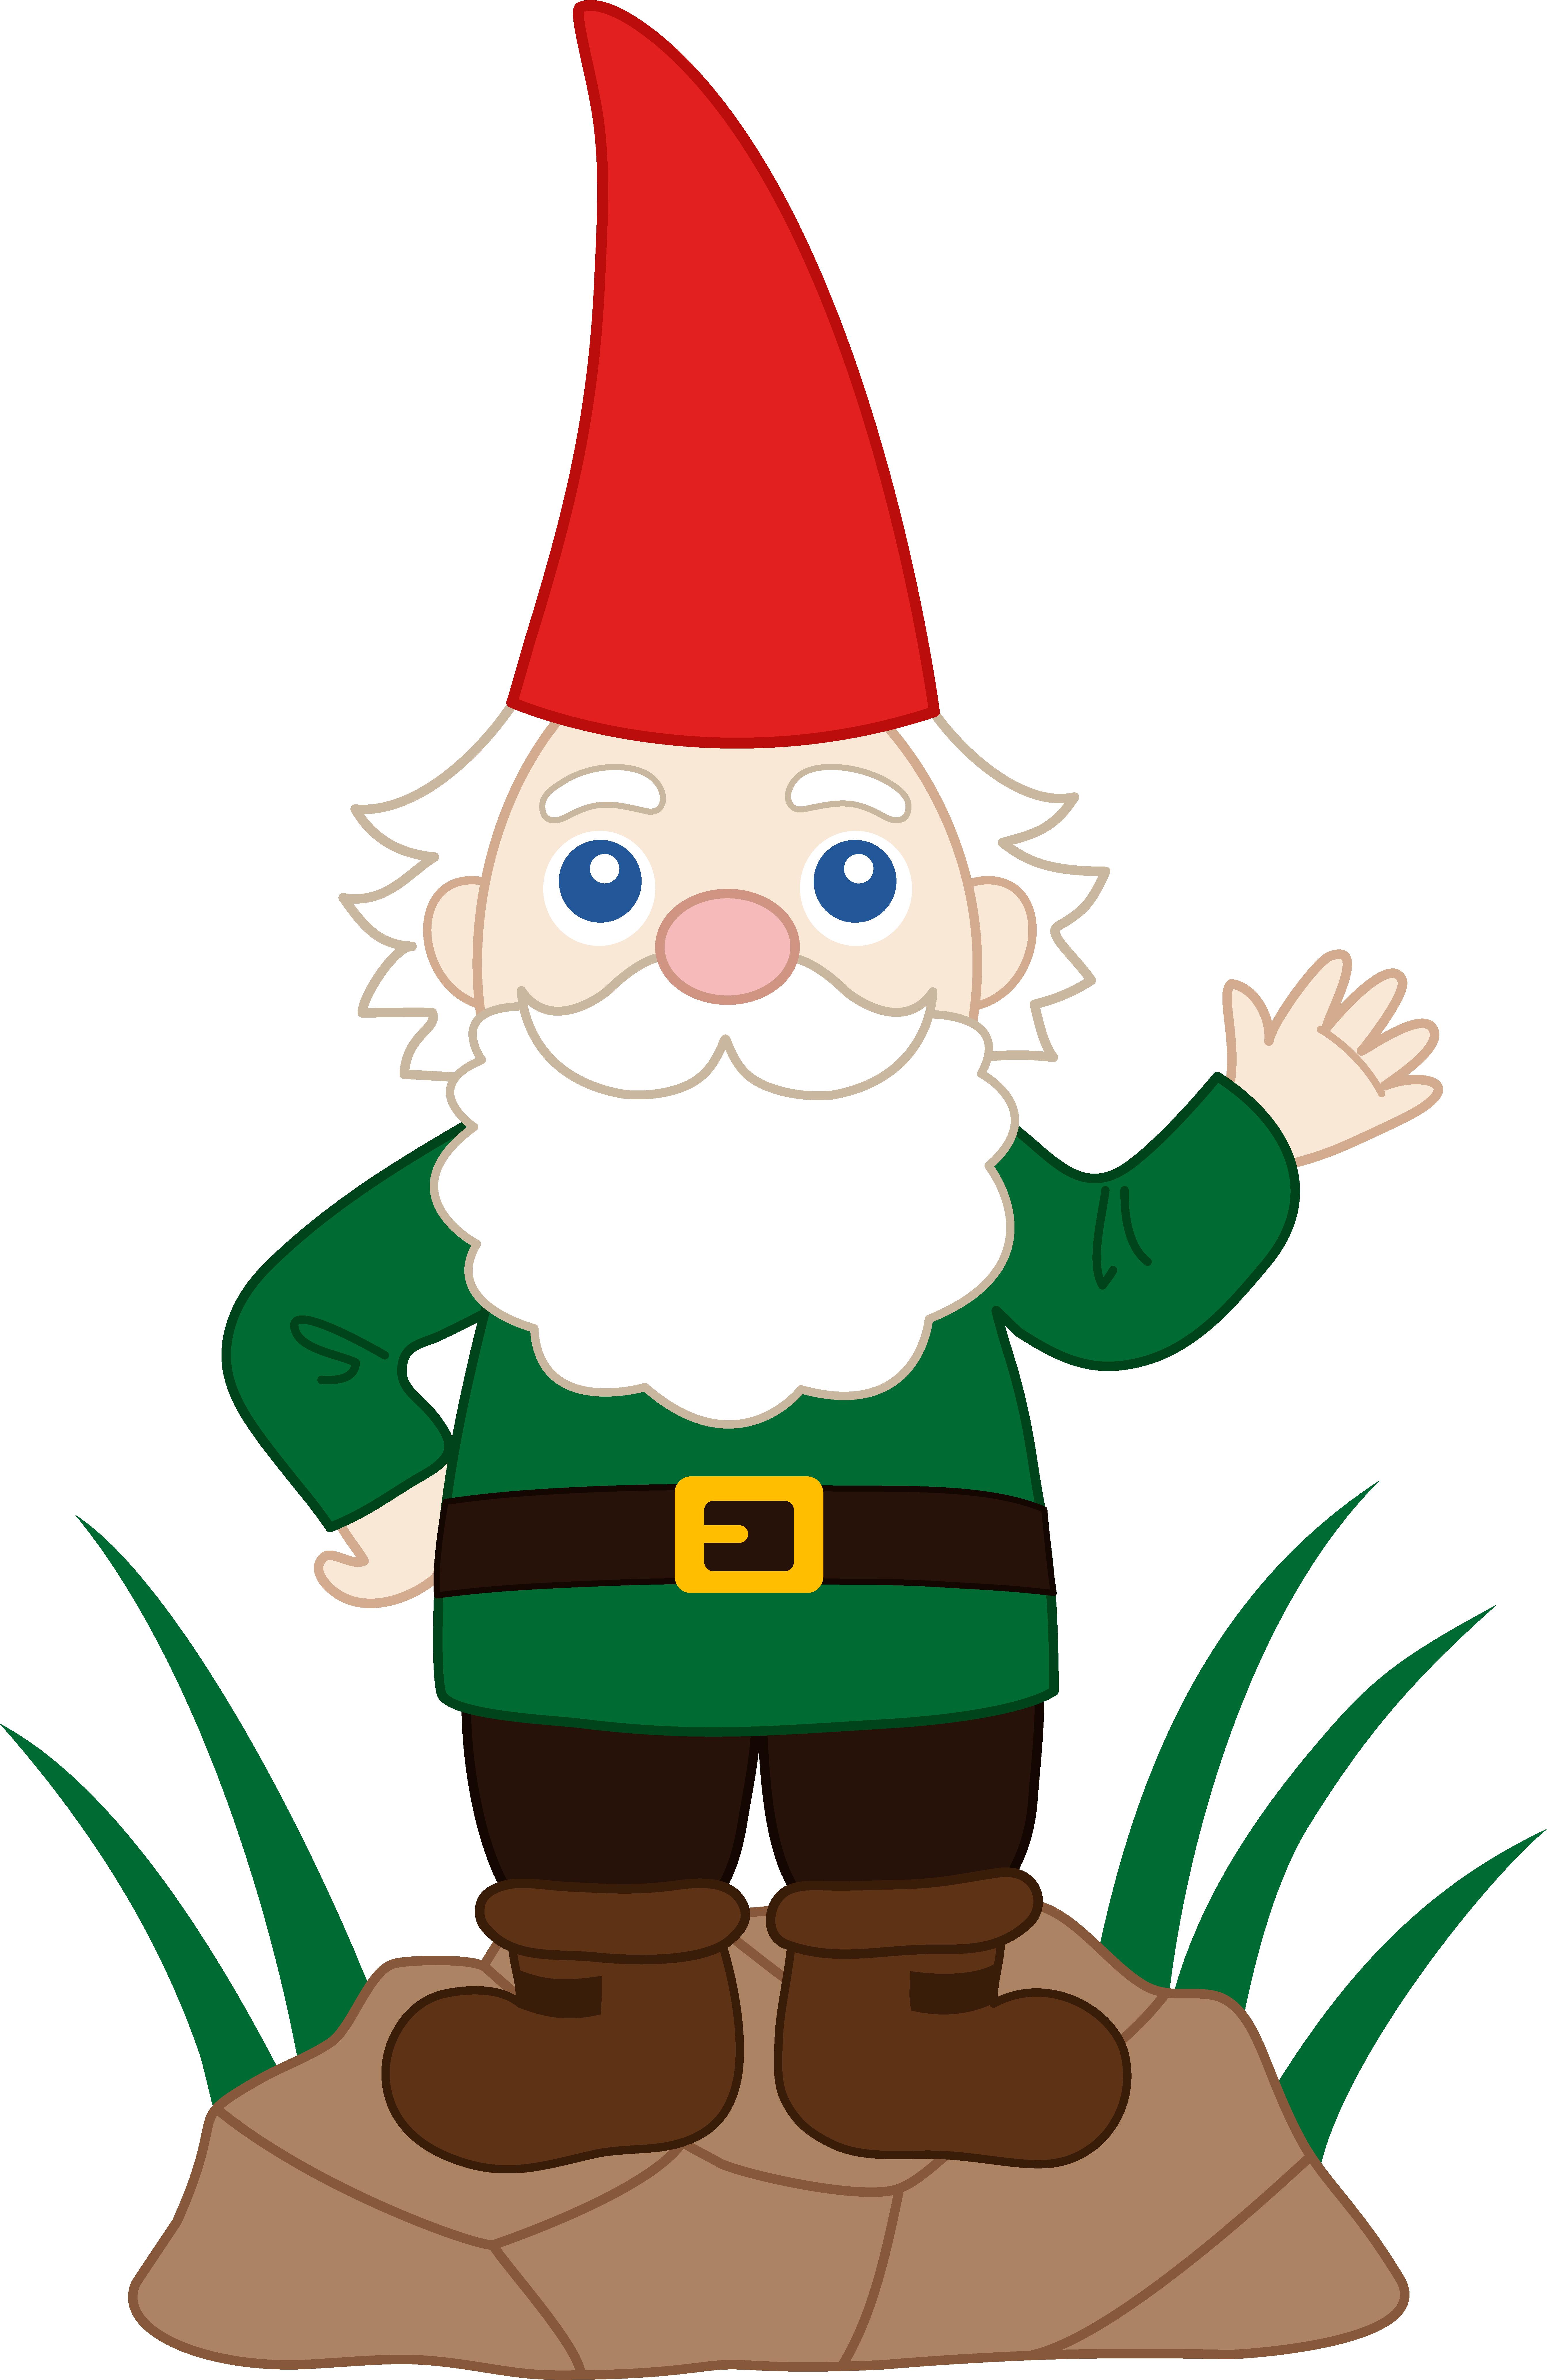 Dwarf clipart Gnome Gnome Art Group Clip